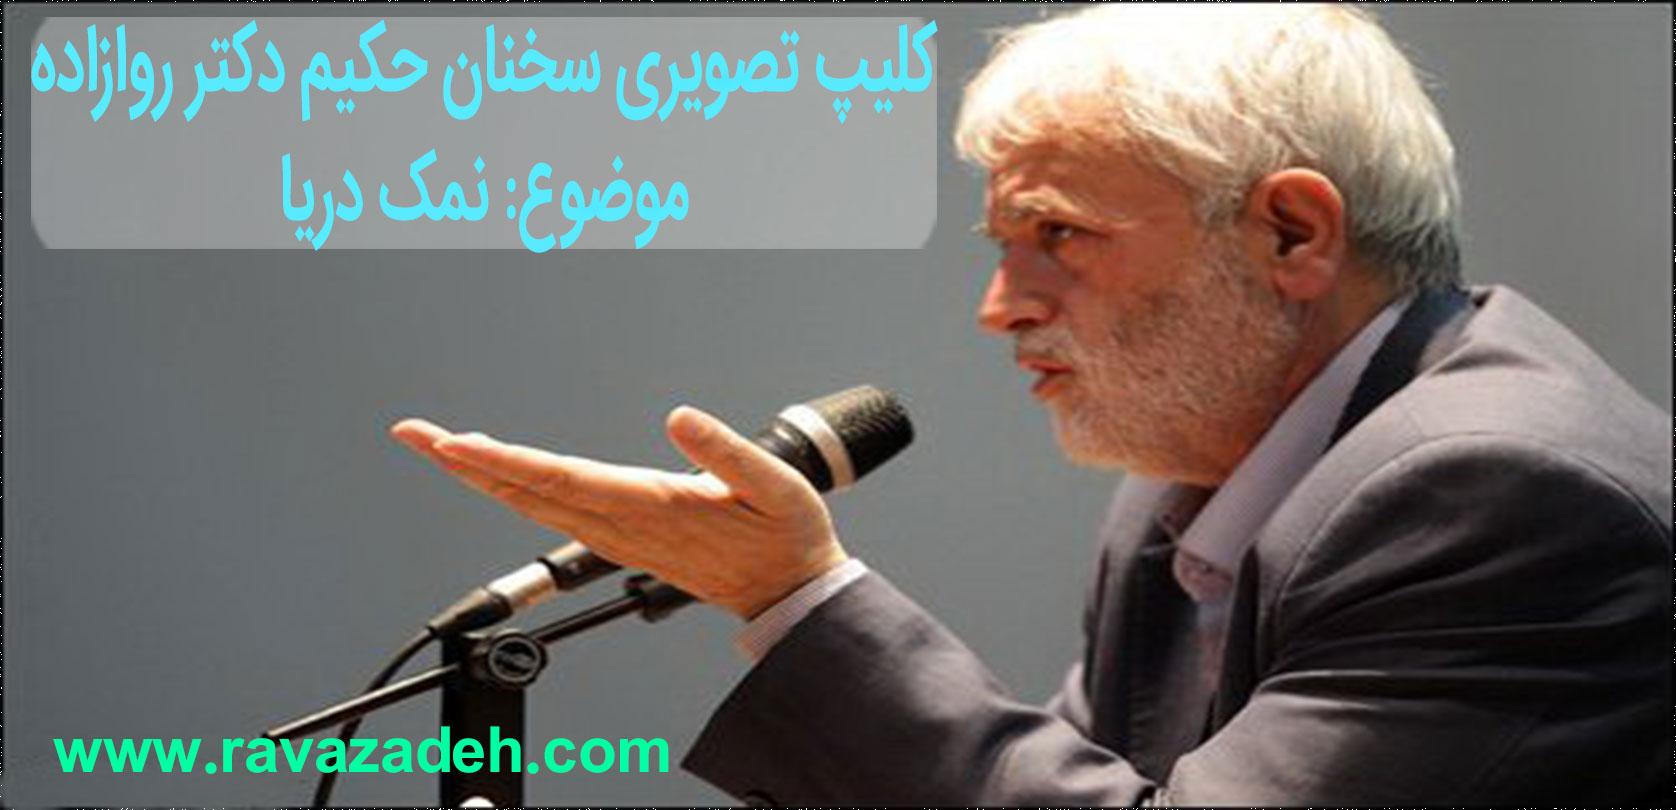 Photo of نمک دریا + کلیپ تصویری سخنرانی حکیم دکتر روازاده